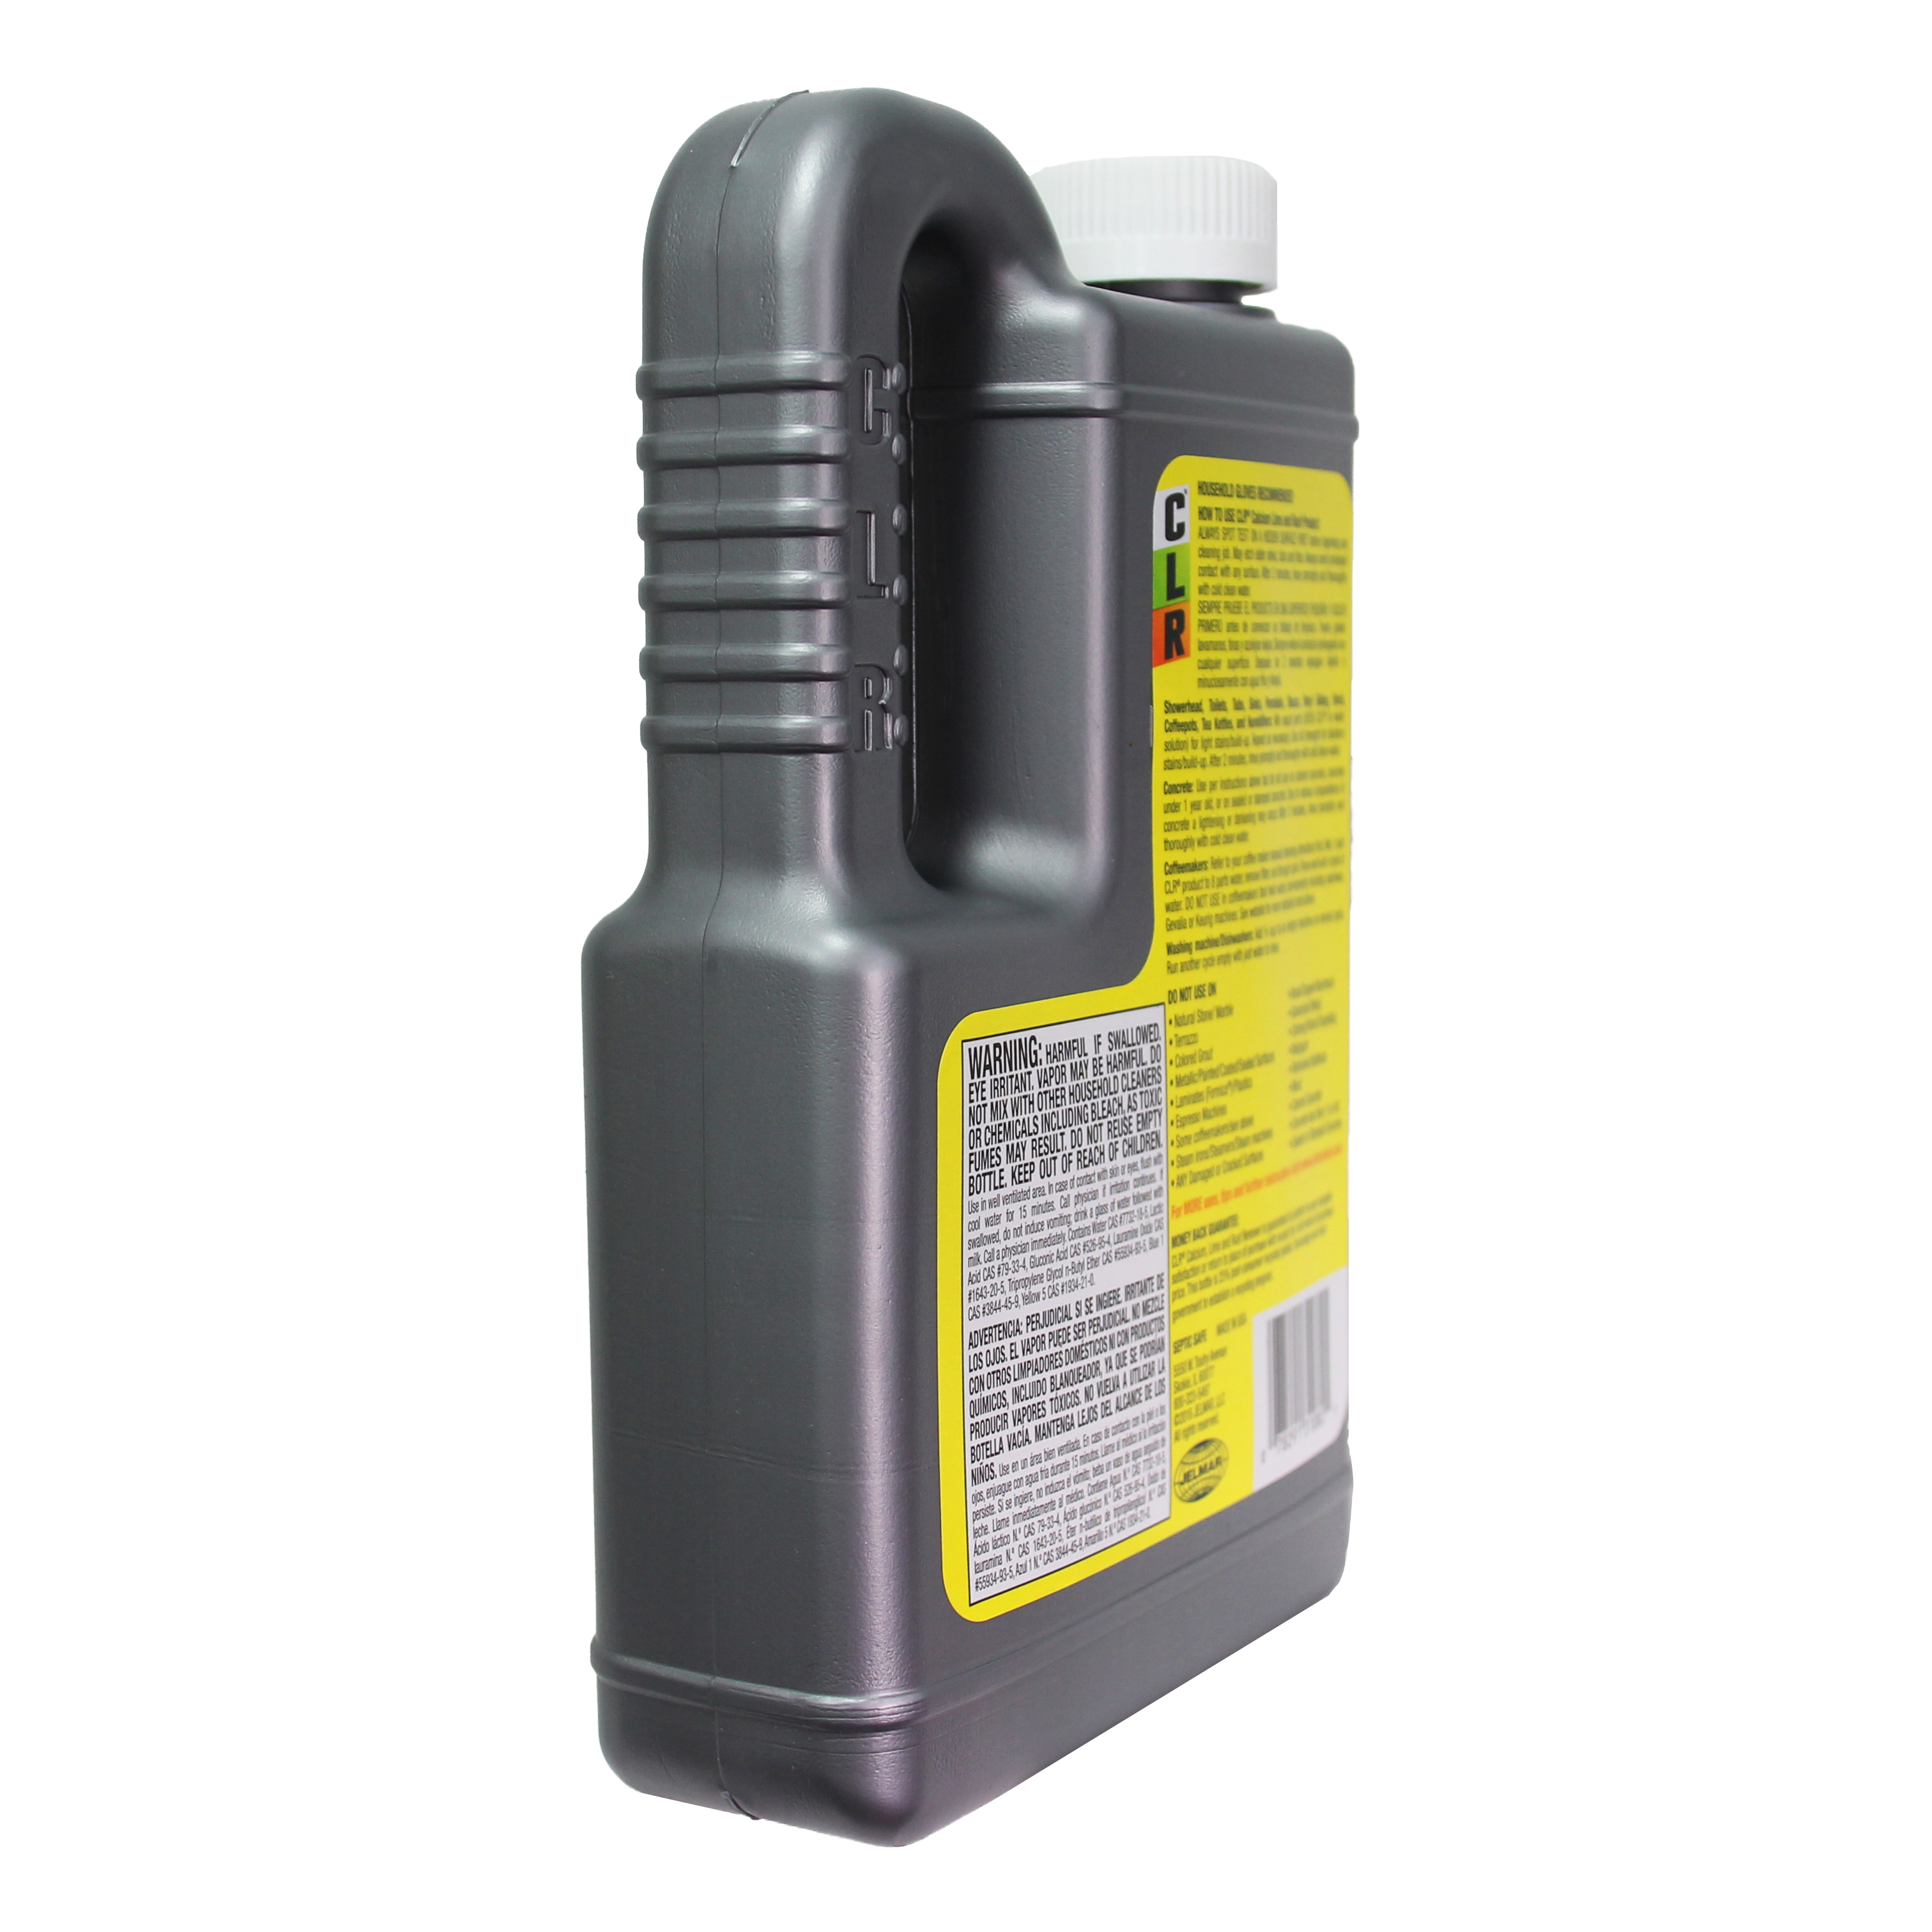 CLR Calcium, Lime \u0026 Rust Remover, 28 fl oz - Walmart.com